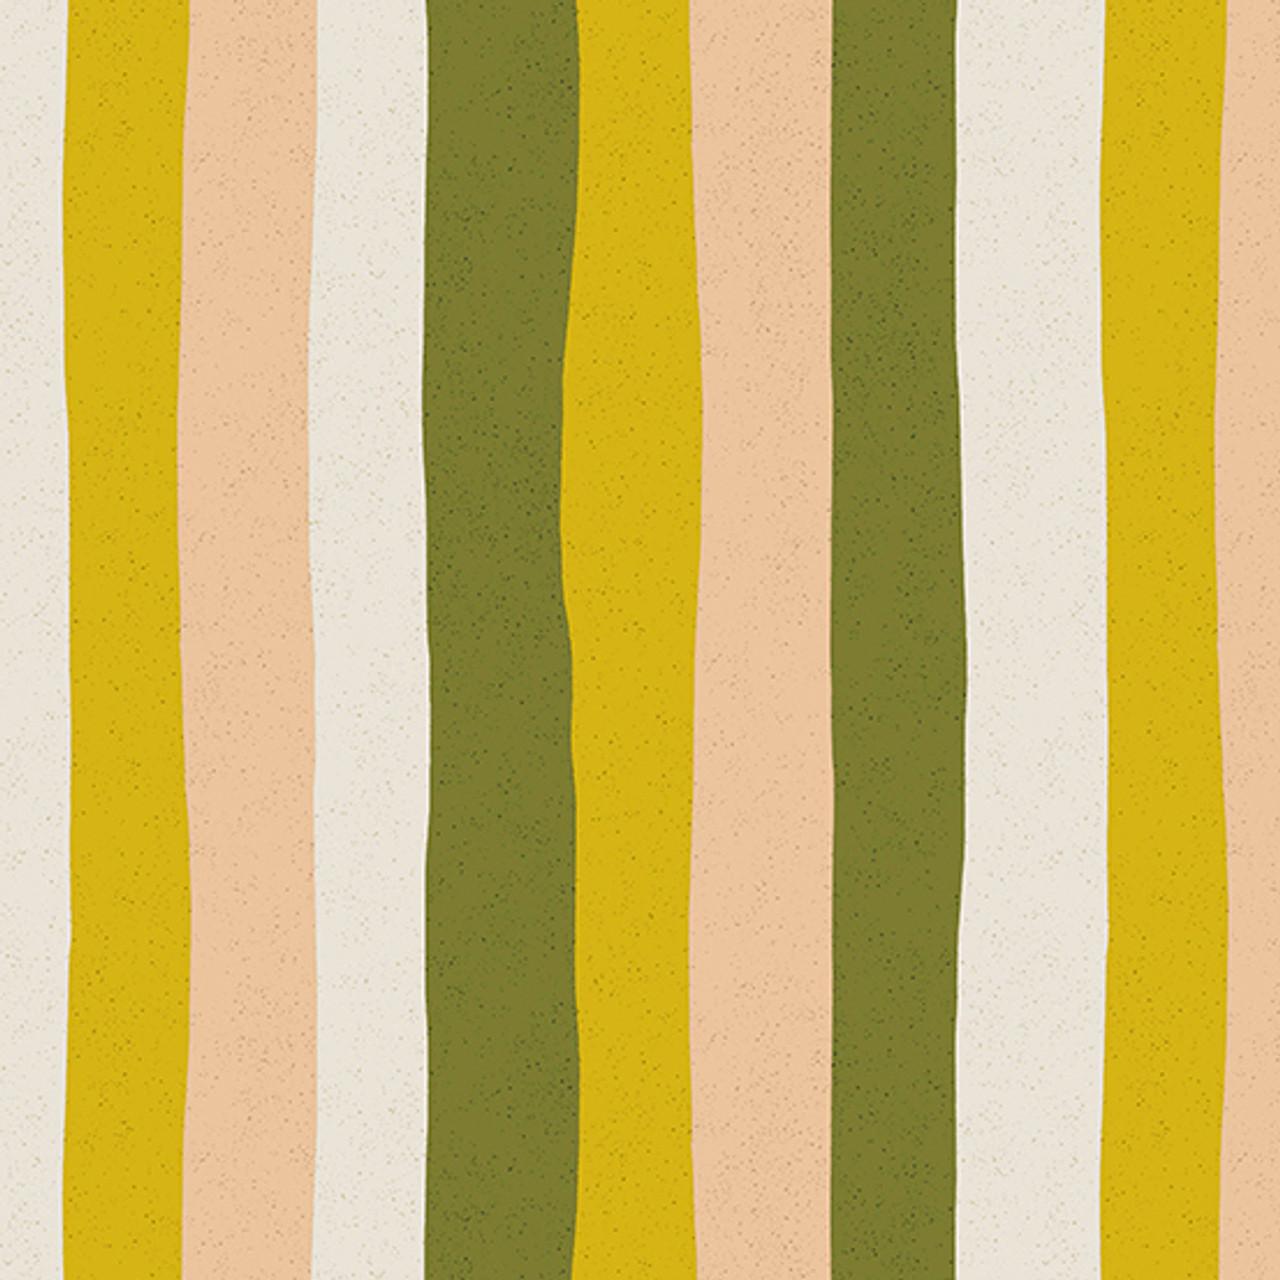 Perennial - Stripes (Citrus)